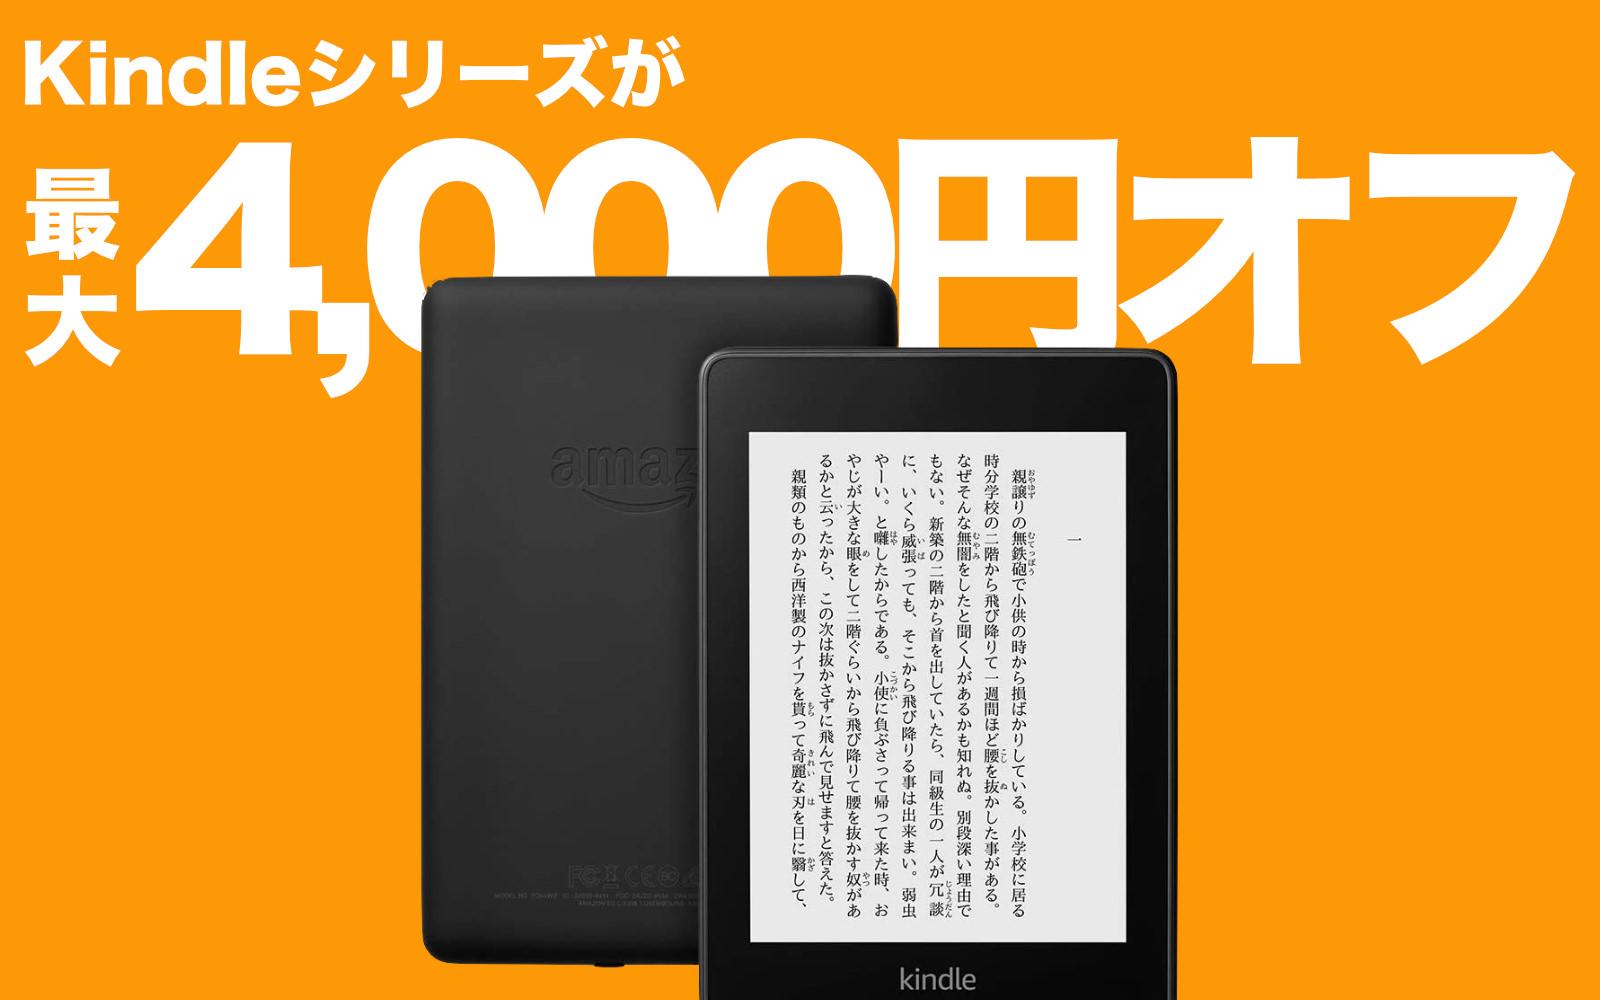 Kindle Tablet sale